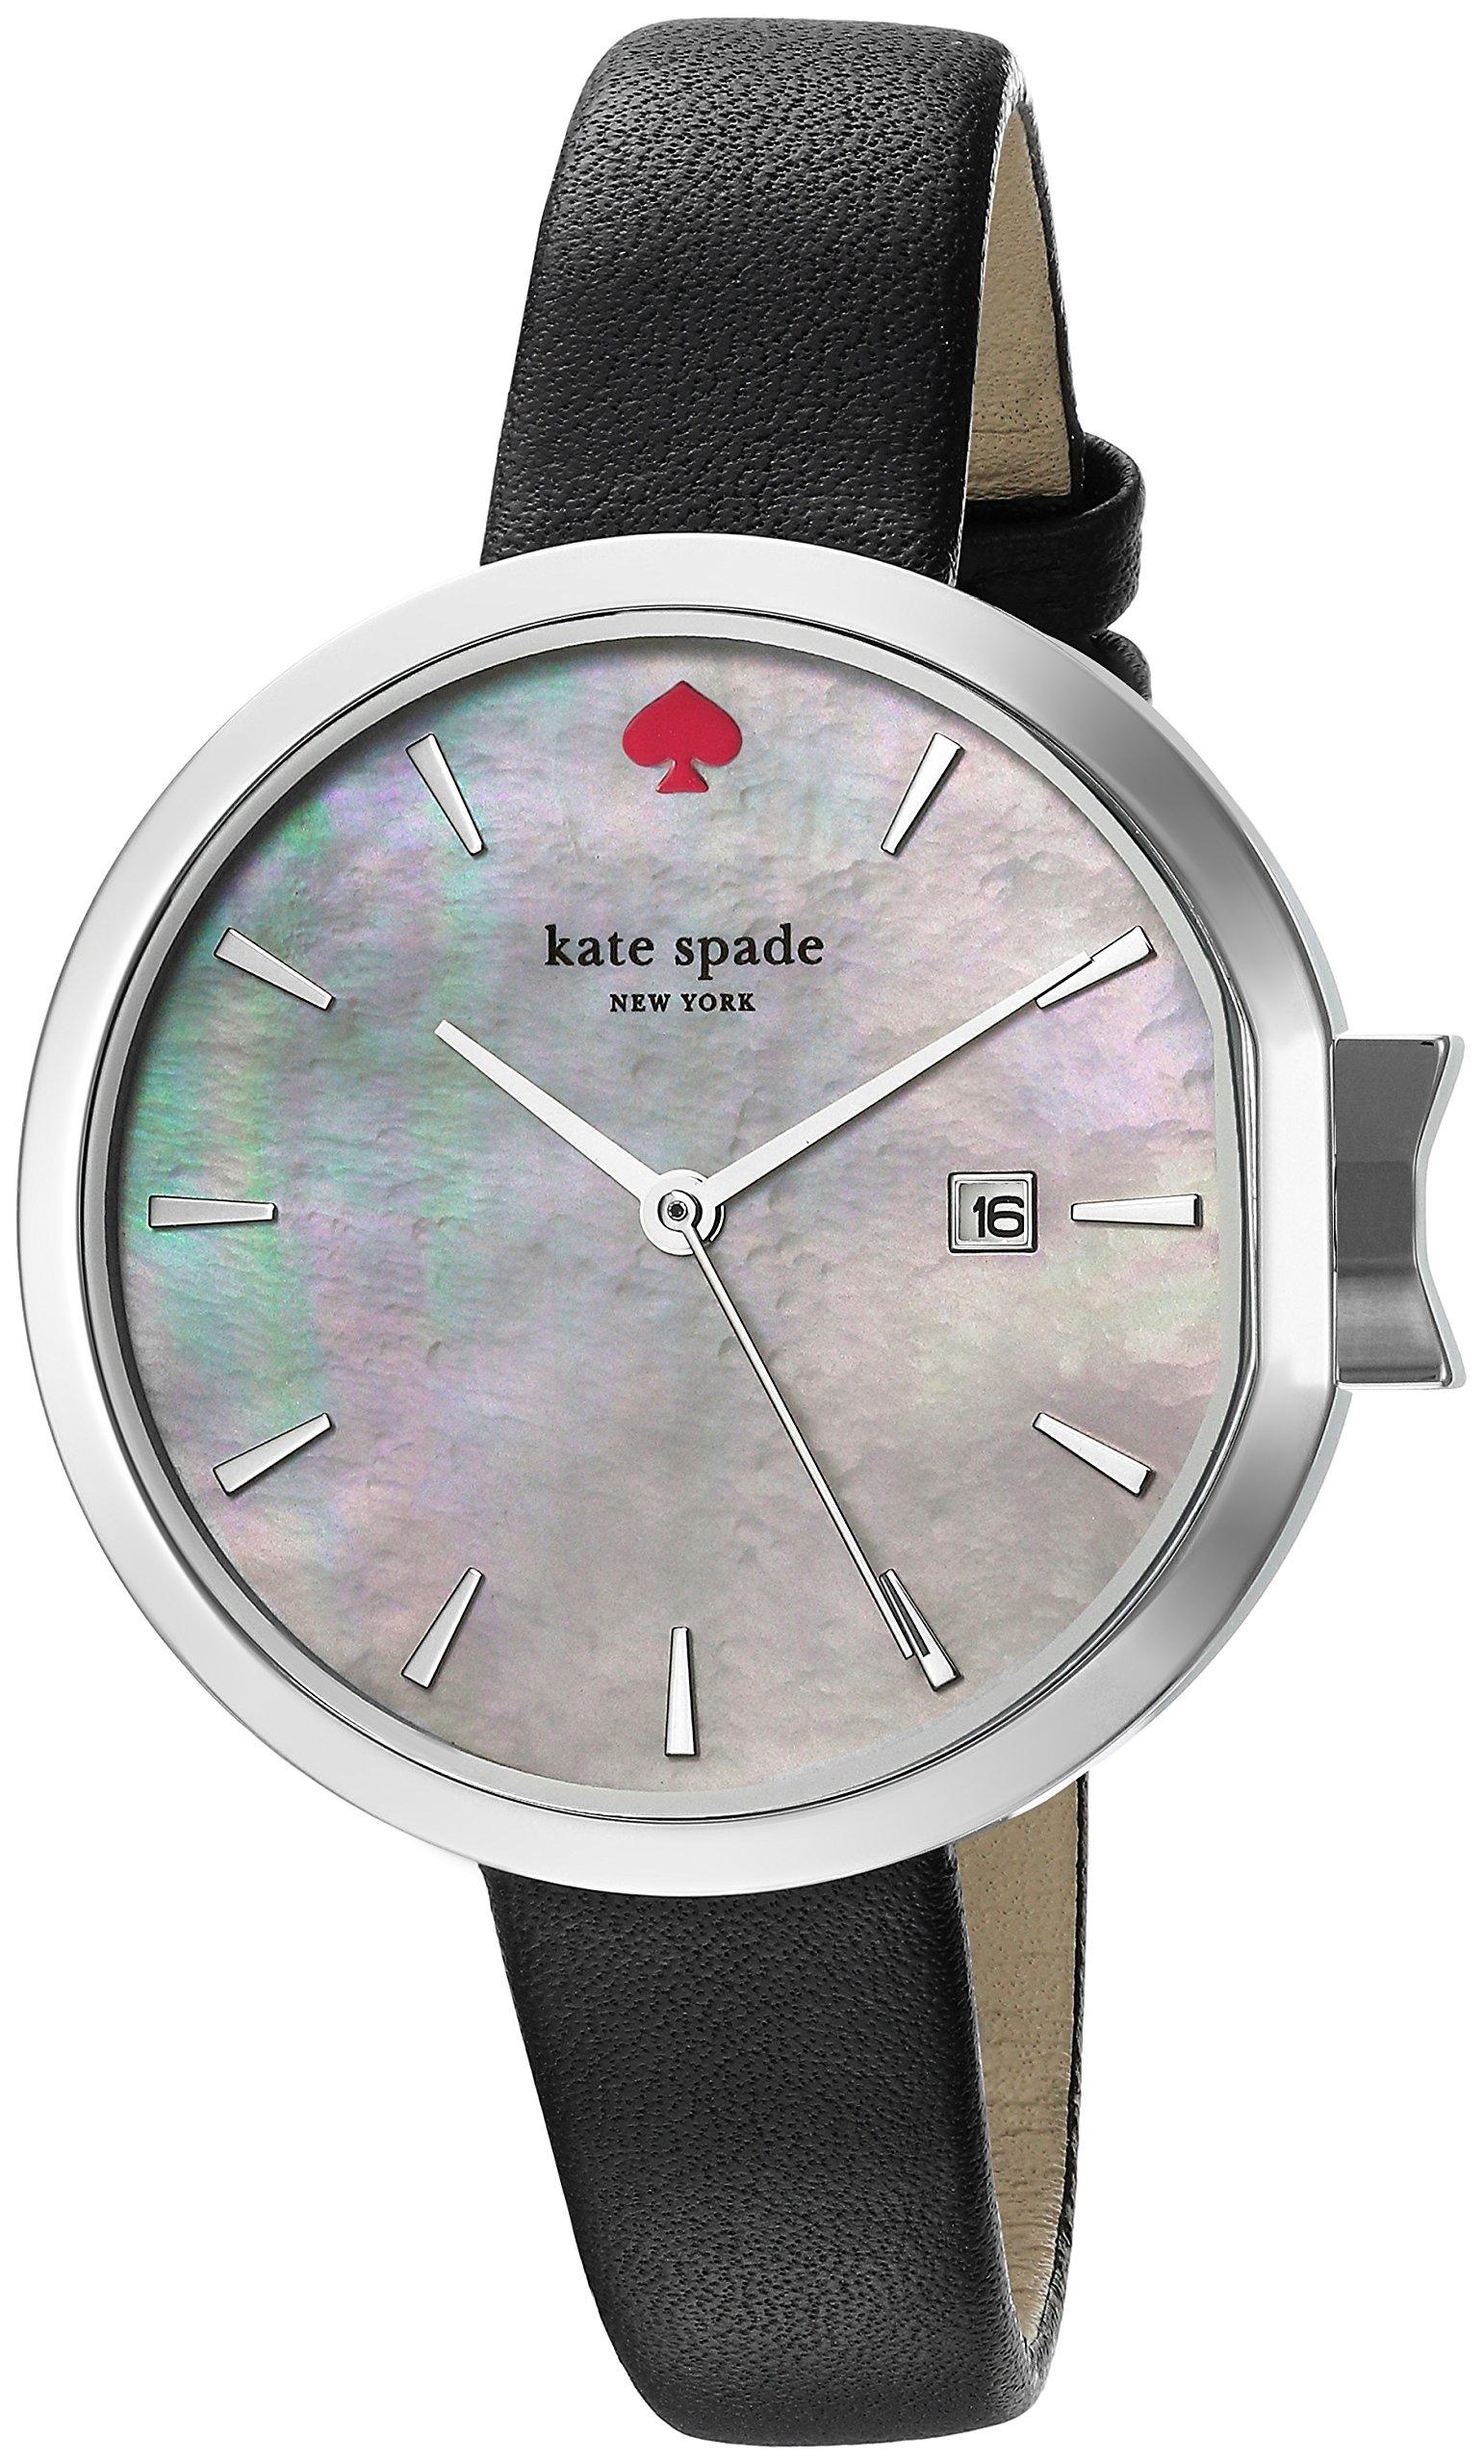 Kate Spade New York Women's KSW1269 Park Row Analog Display Japanese Quartz Black Watch